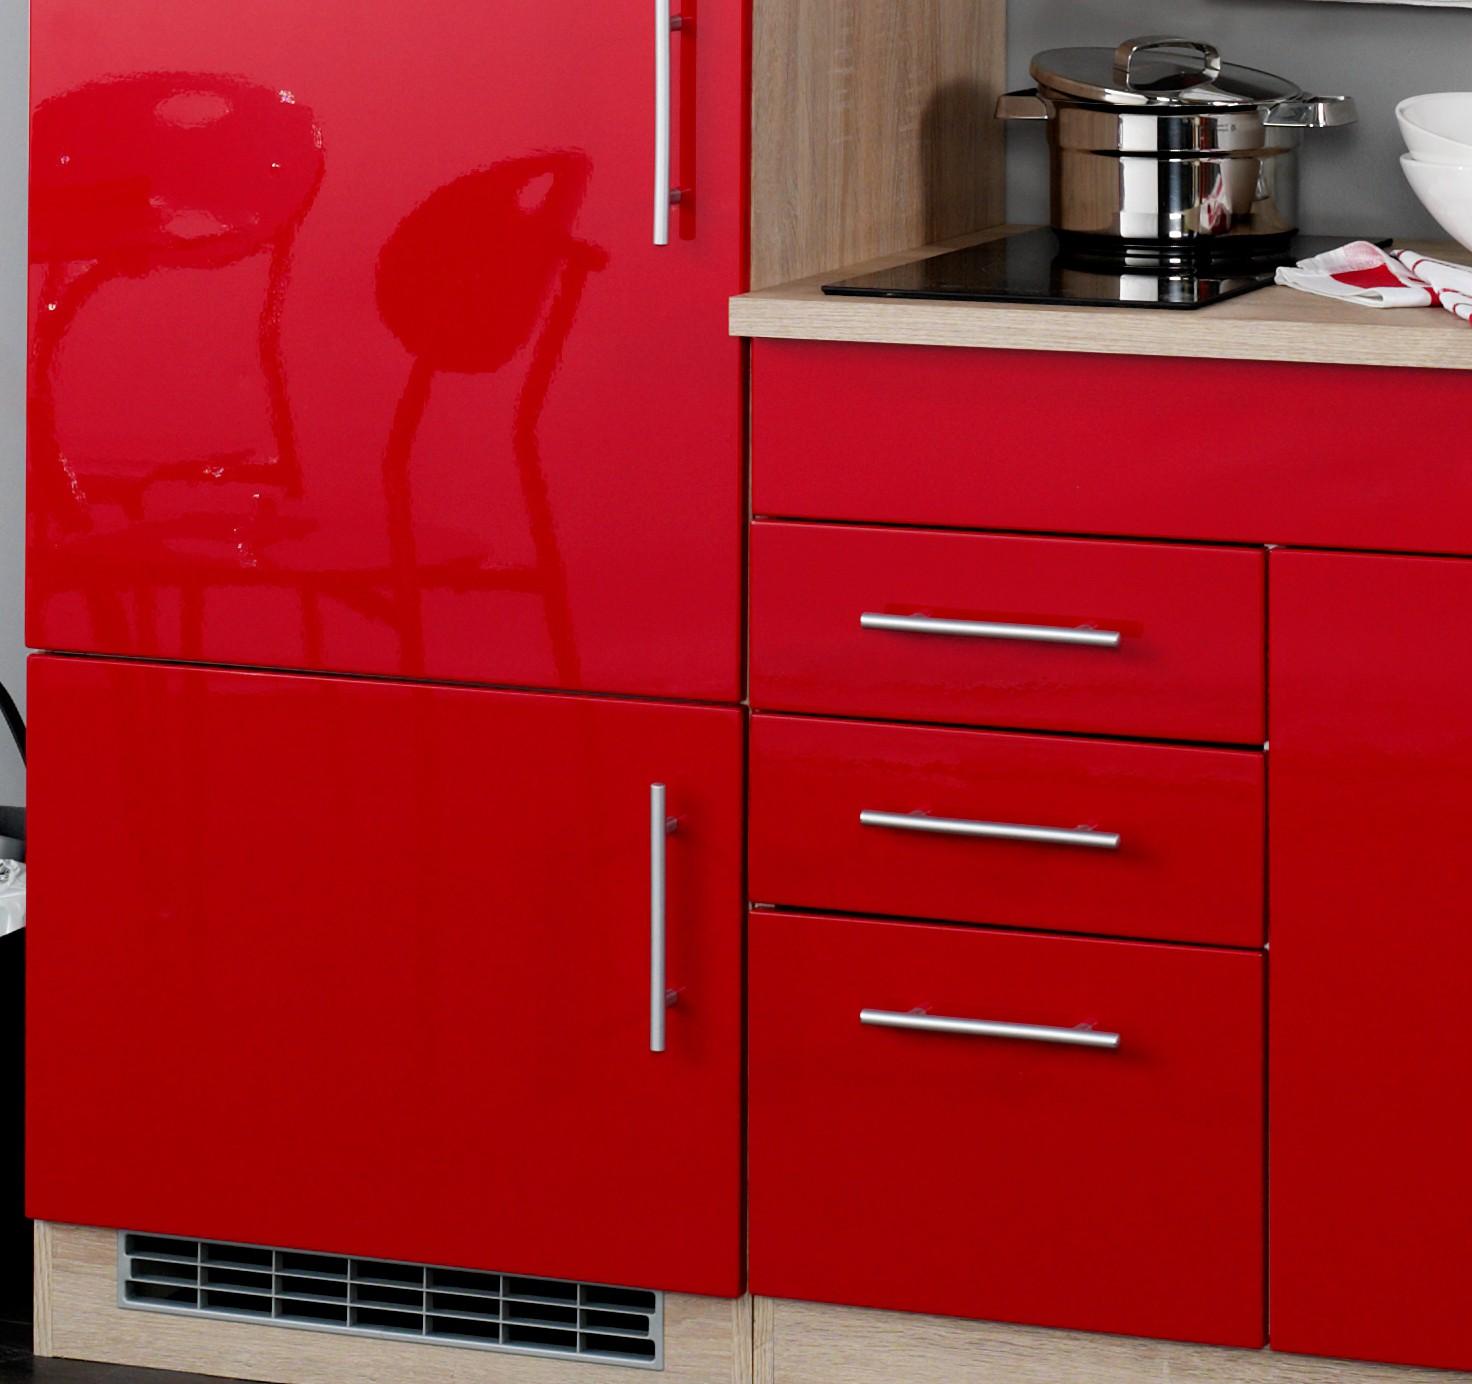 neu singlek che berlin mit glaskeramikkochfeld minik che 180cm rot sonoma ebay. Black Bedroom Furniture Sets. Home Design Ideas